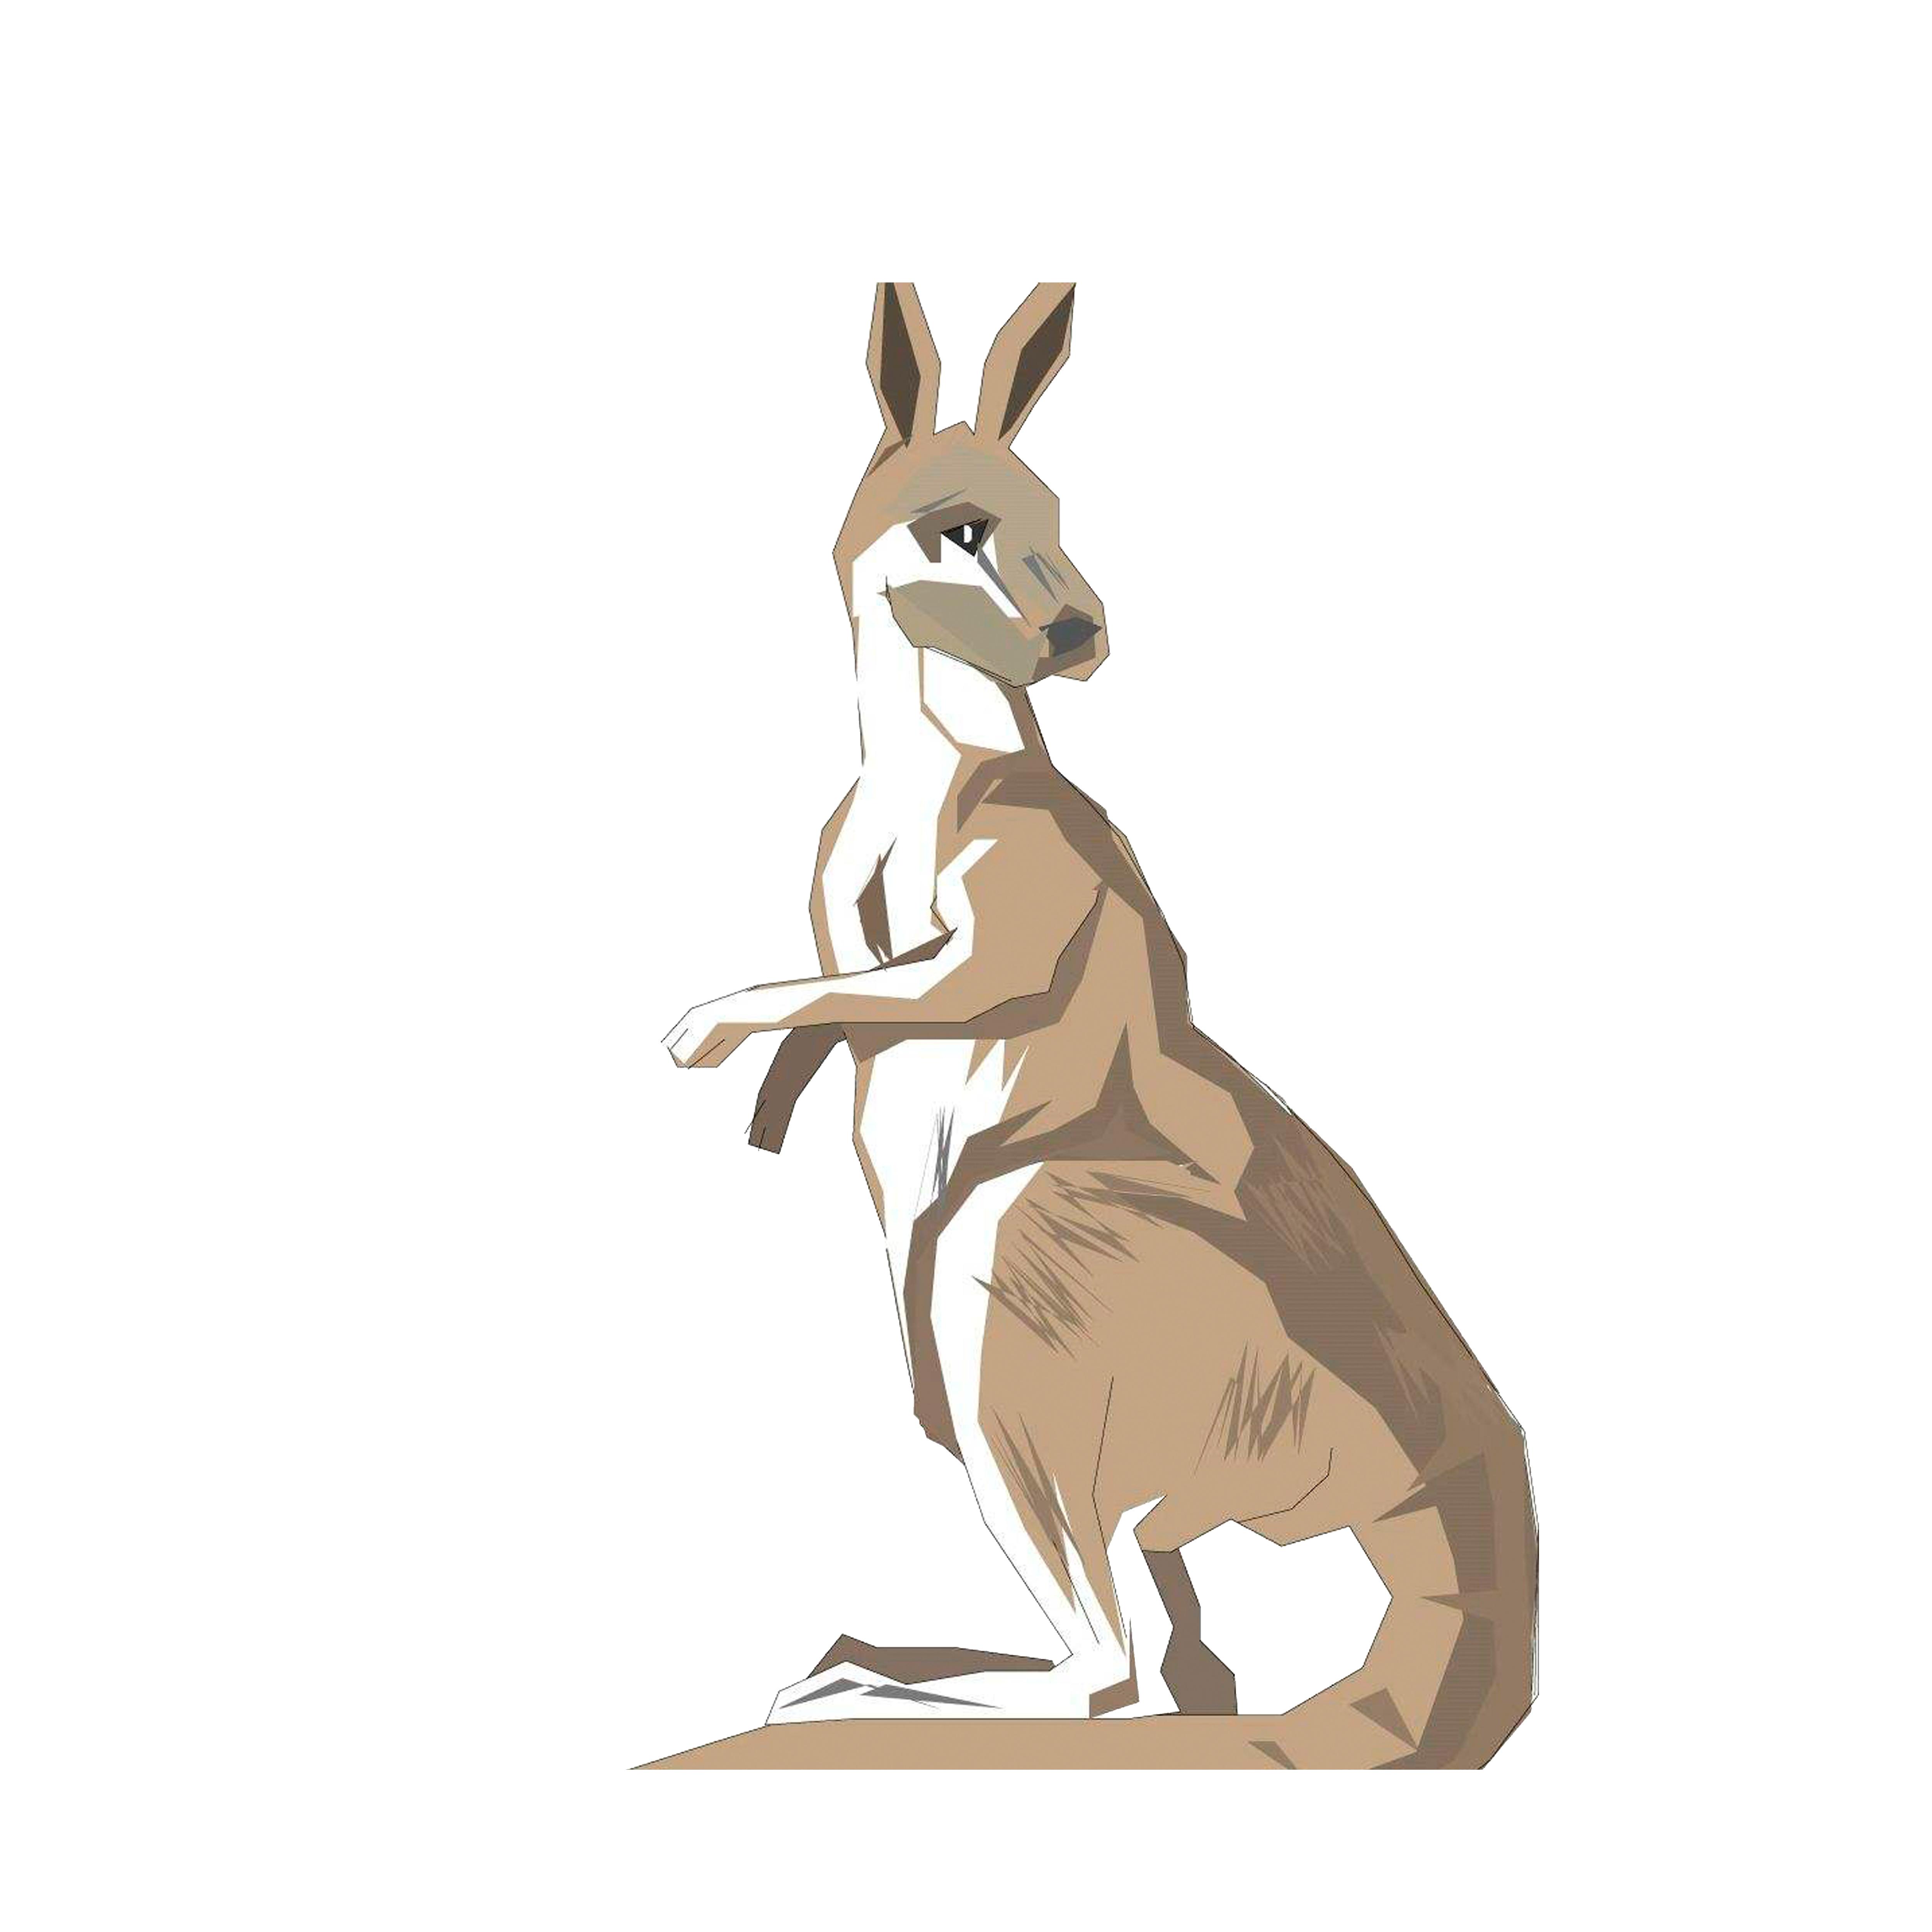 Australia drawing clip art. Kangaroo clipart animal australian